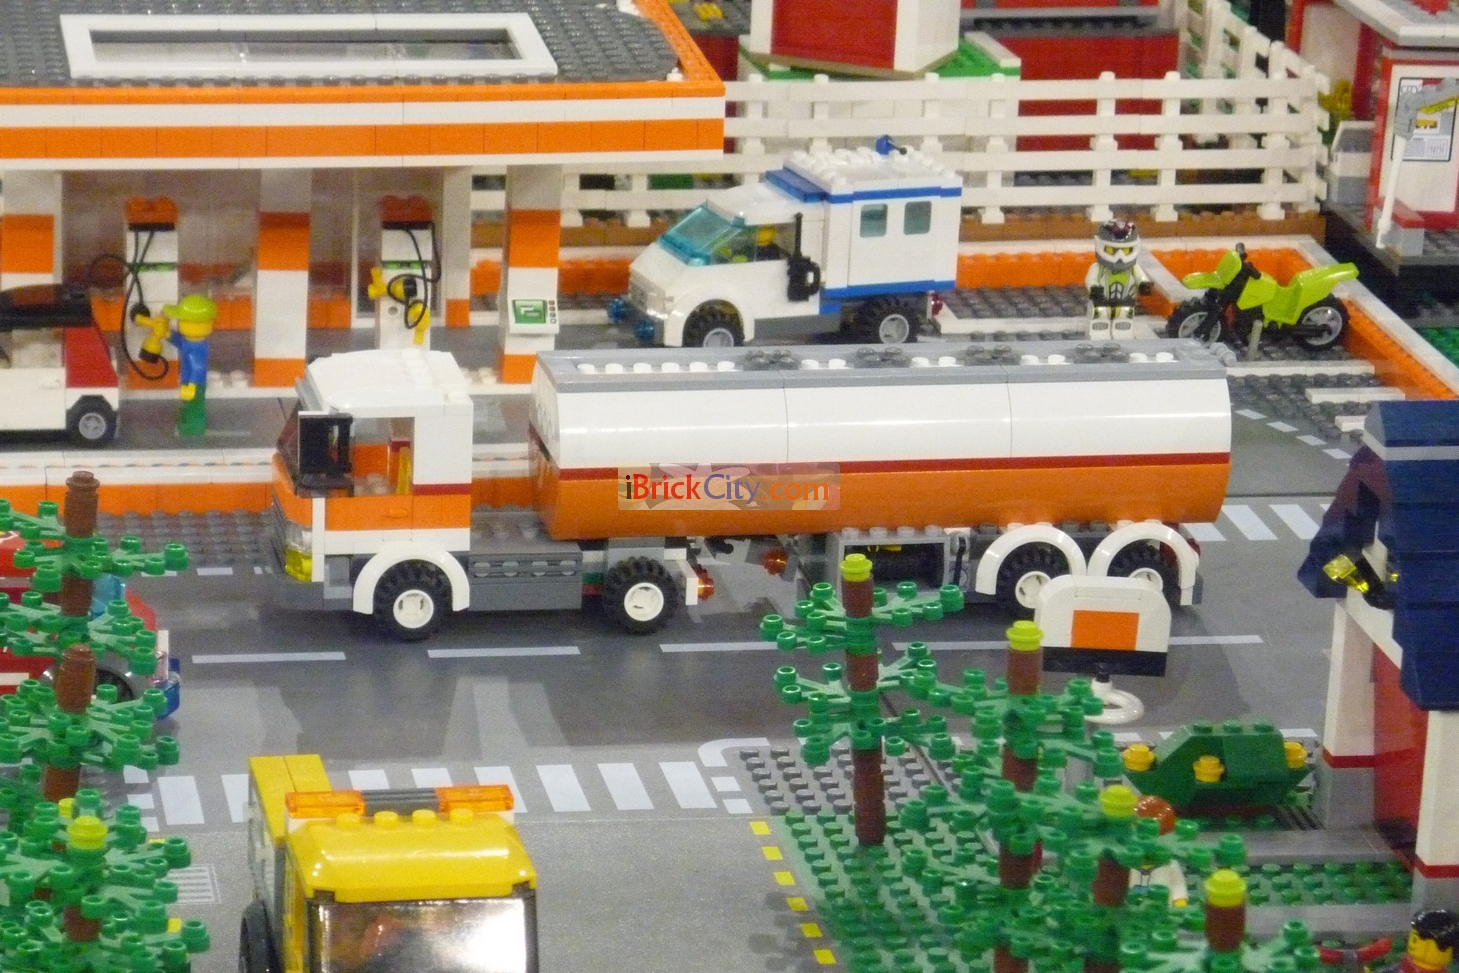 Lego fan event 2012 in lisbon part 1 city i brick city - Image lego city ...